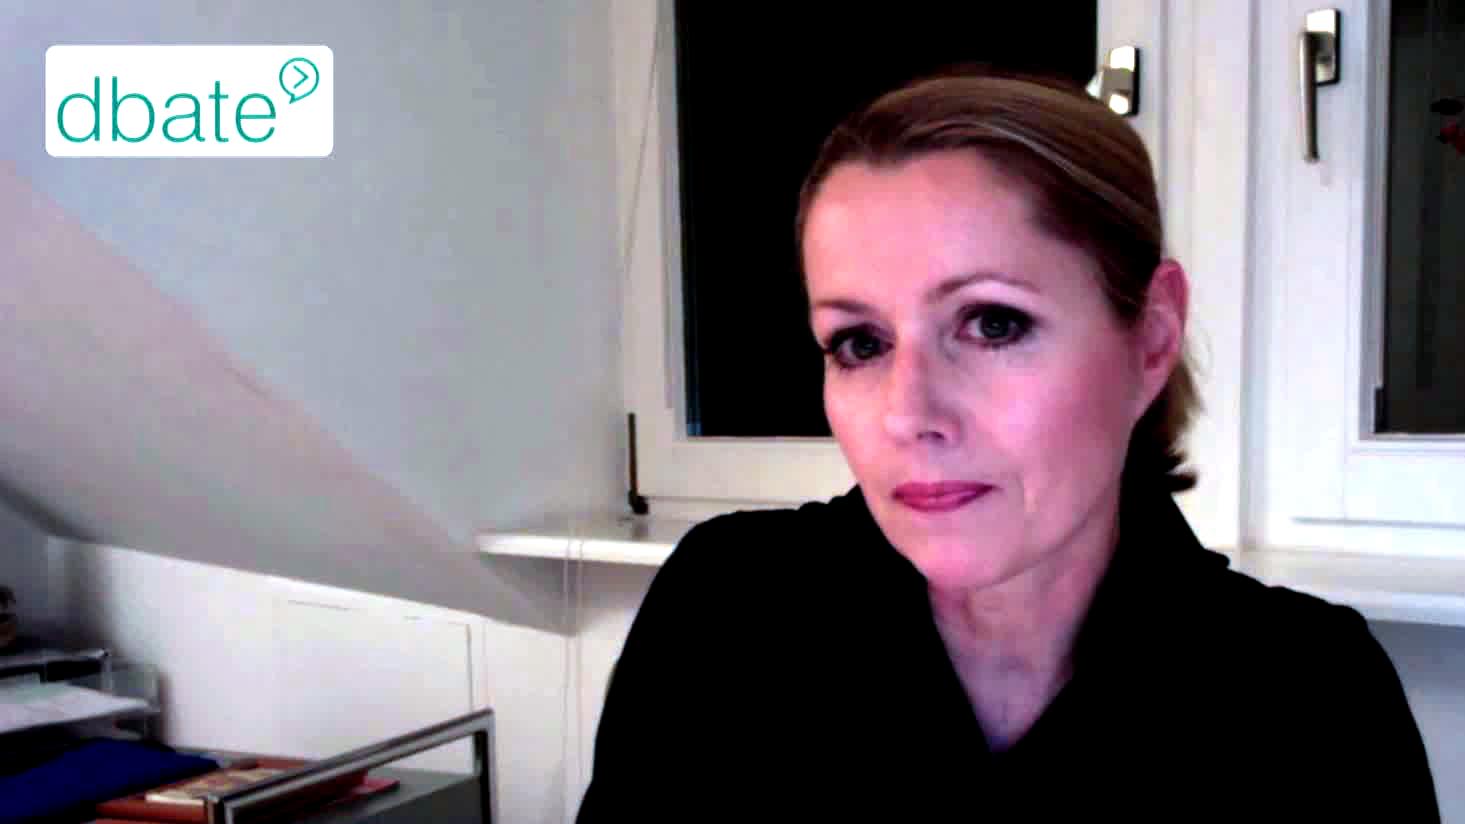 dbate.de_Screenshot_Skype-Talk_Astrid Frohloff_ARD_Reporter ohne Grenzen_Journalist_2014